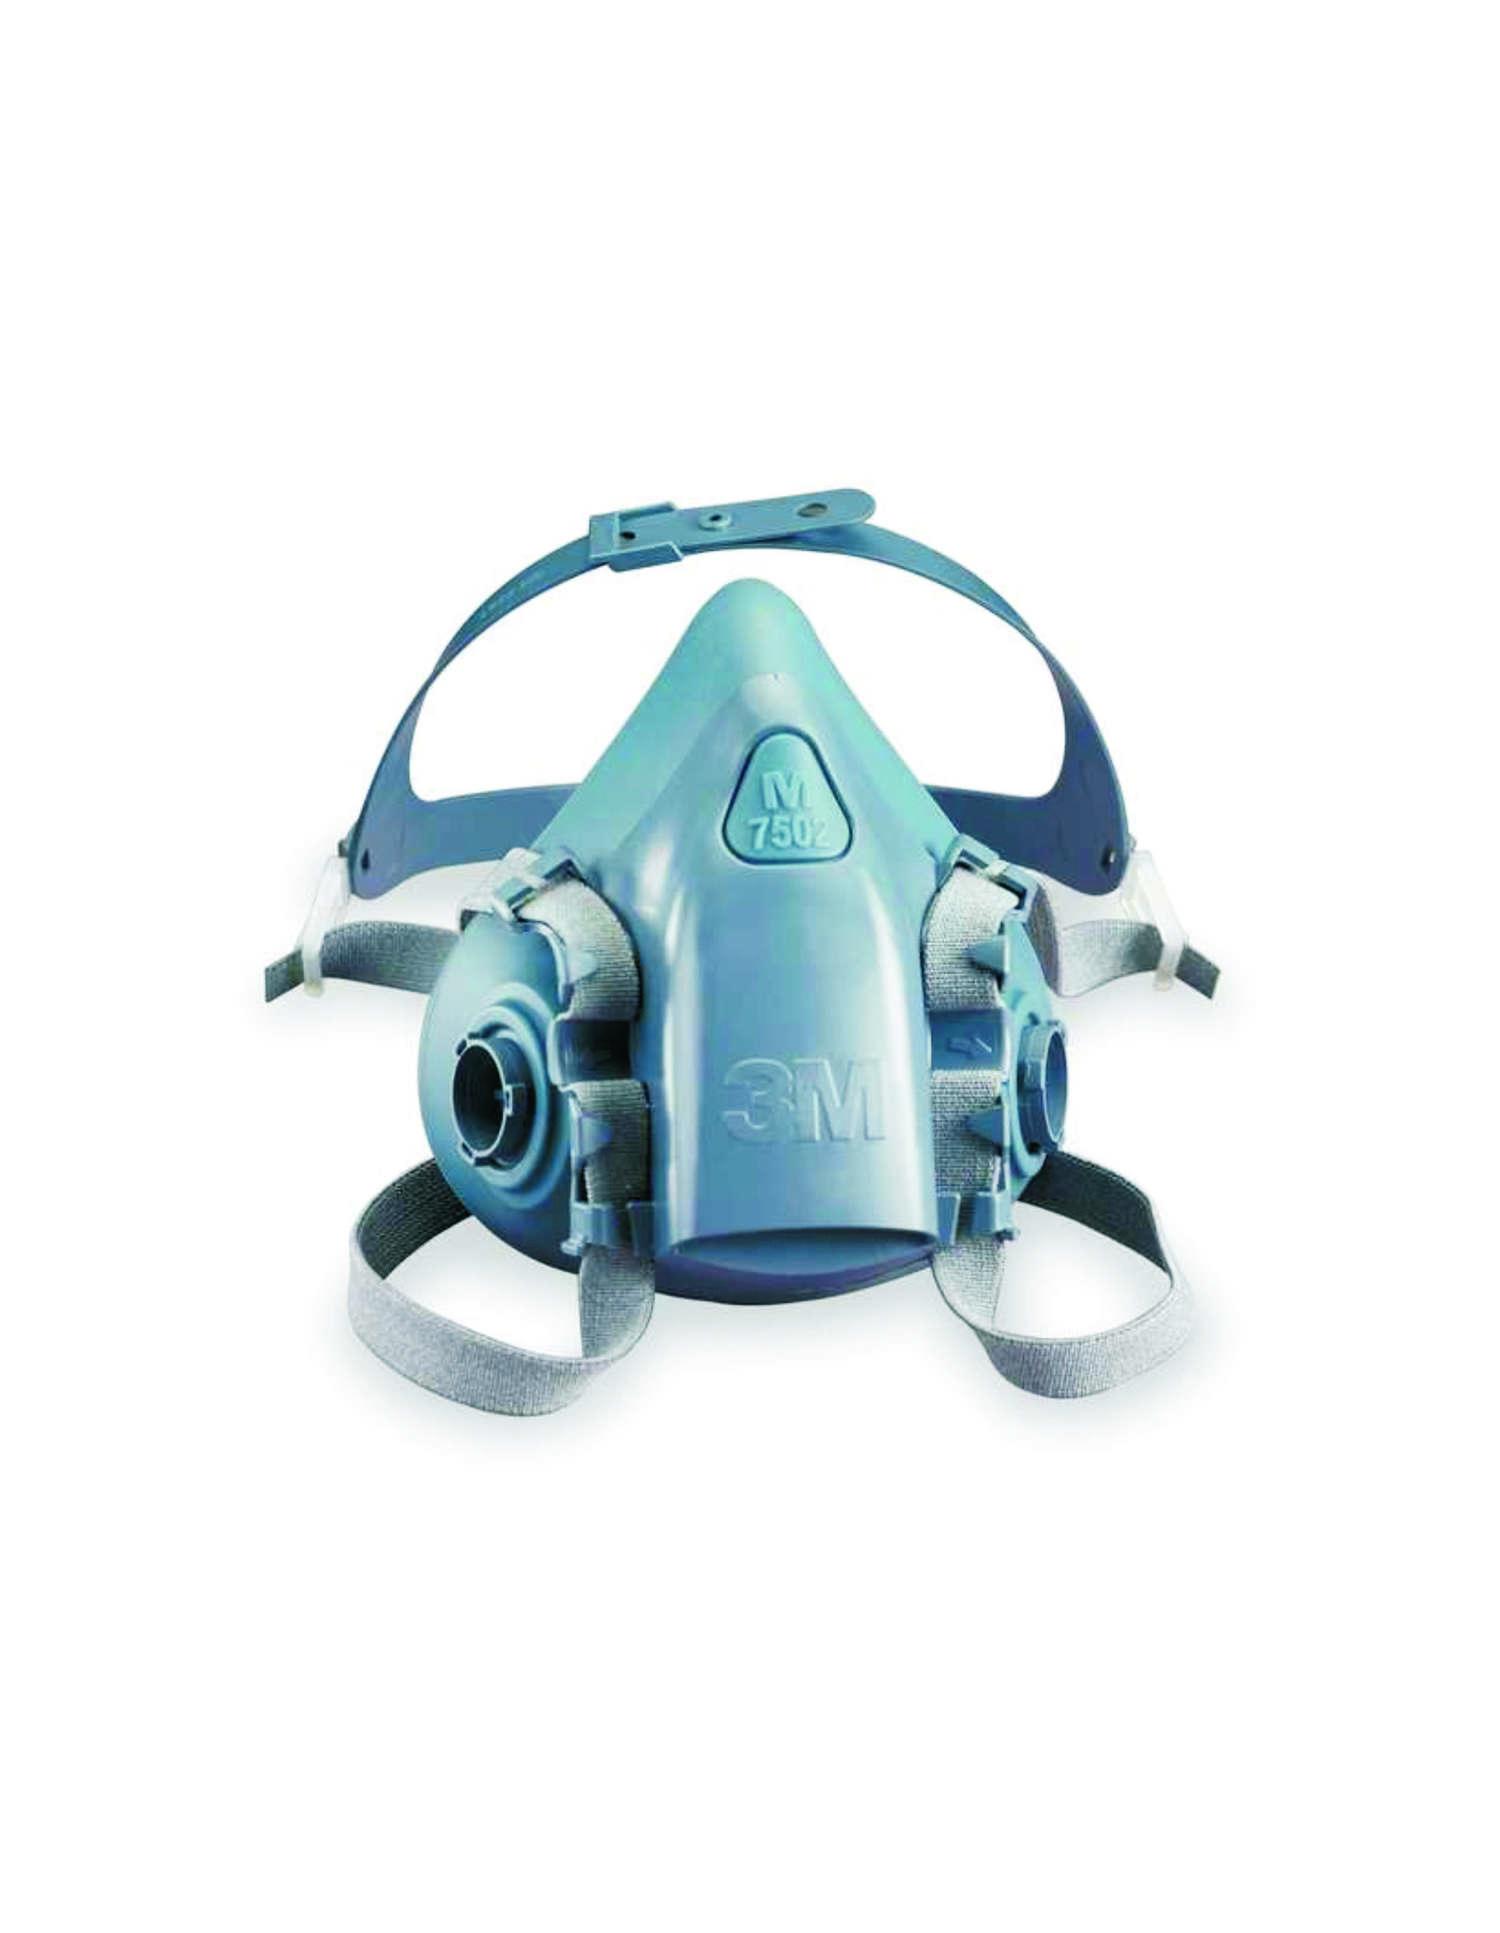 3m 7500 dust mask